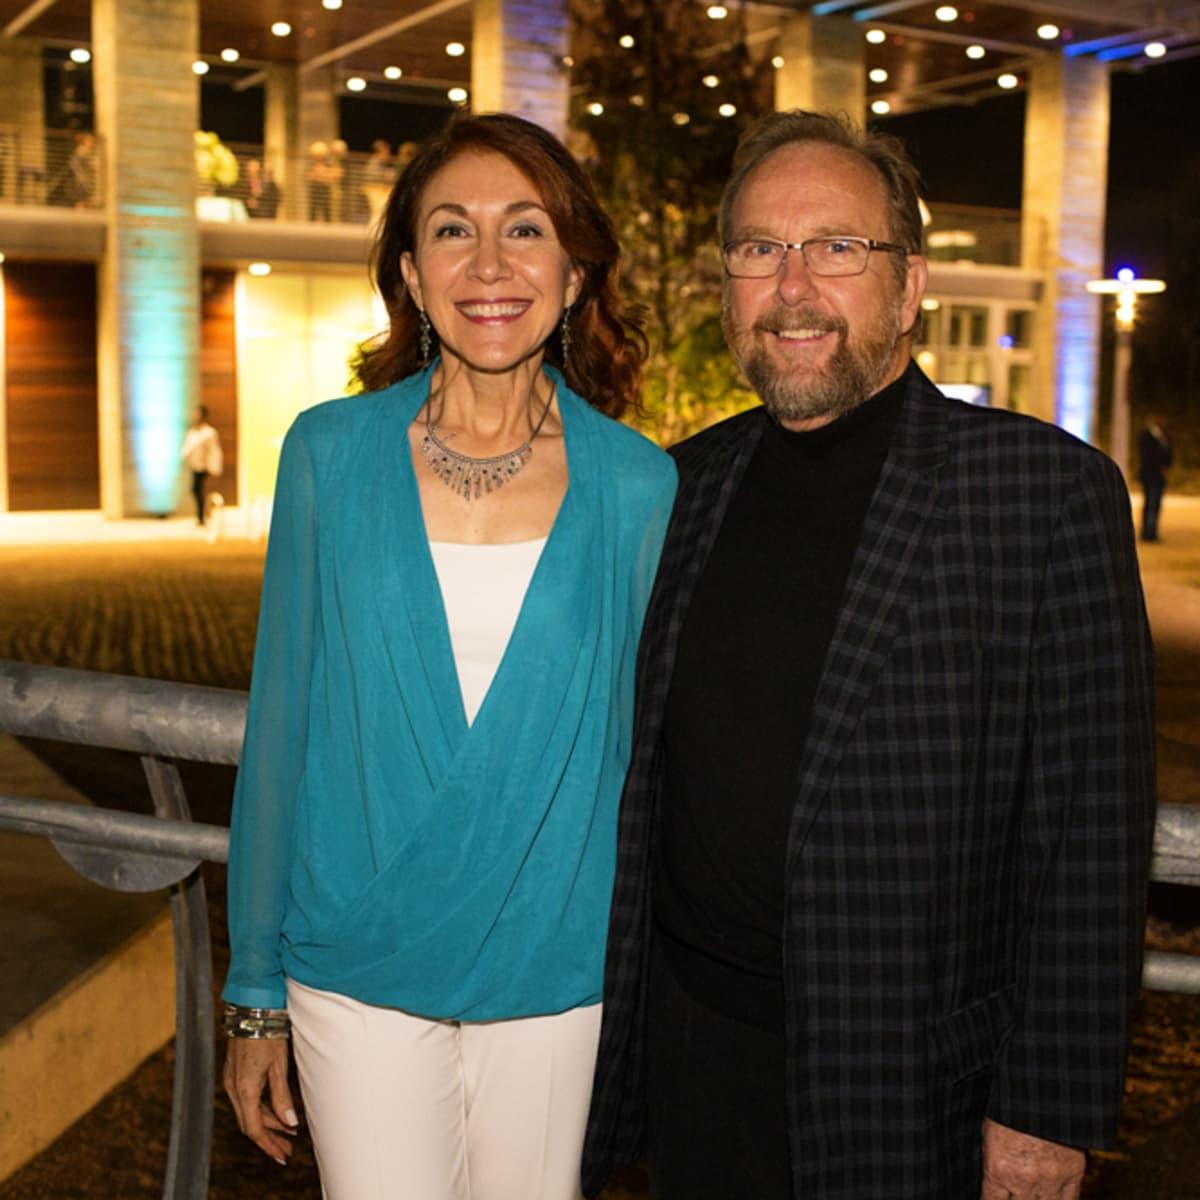 News, Shelby, Buffalo Bayou Partnership gala, Nov. 2015, Edna Ramos, John Cryer